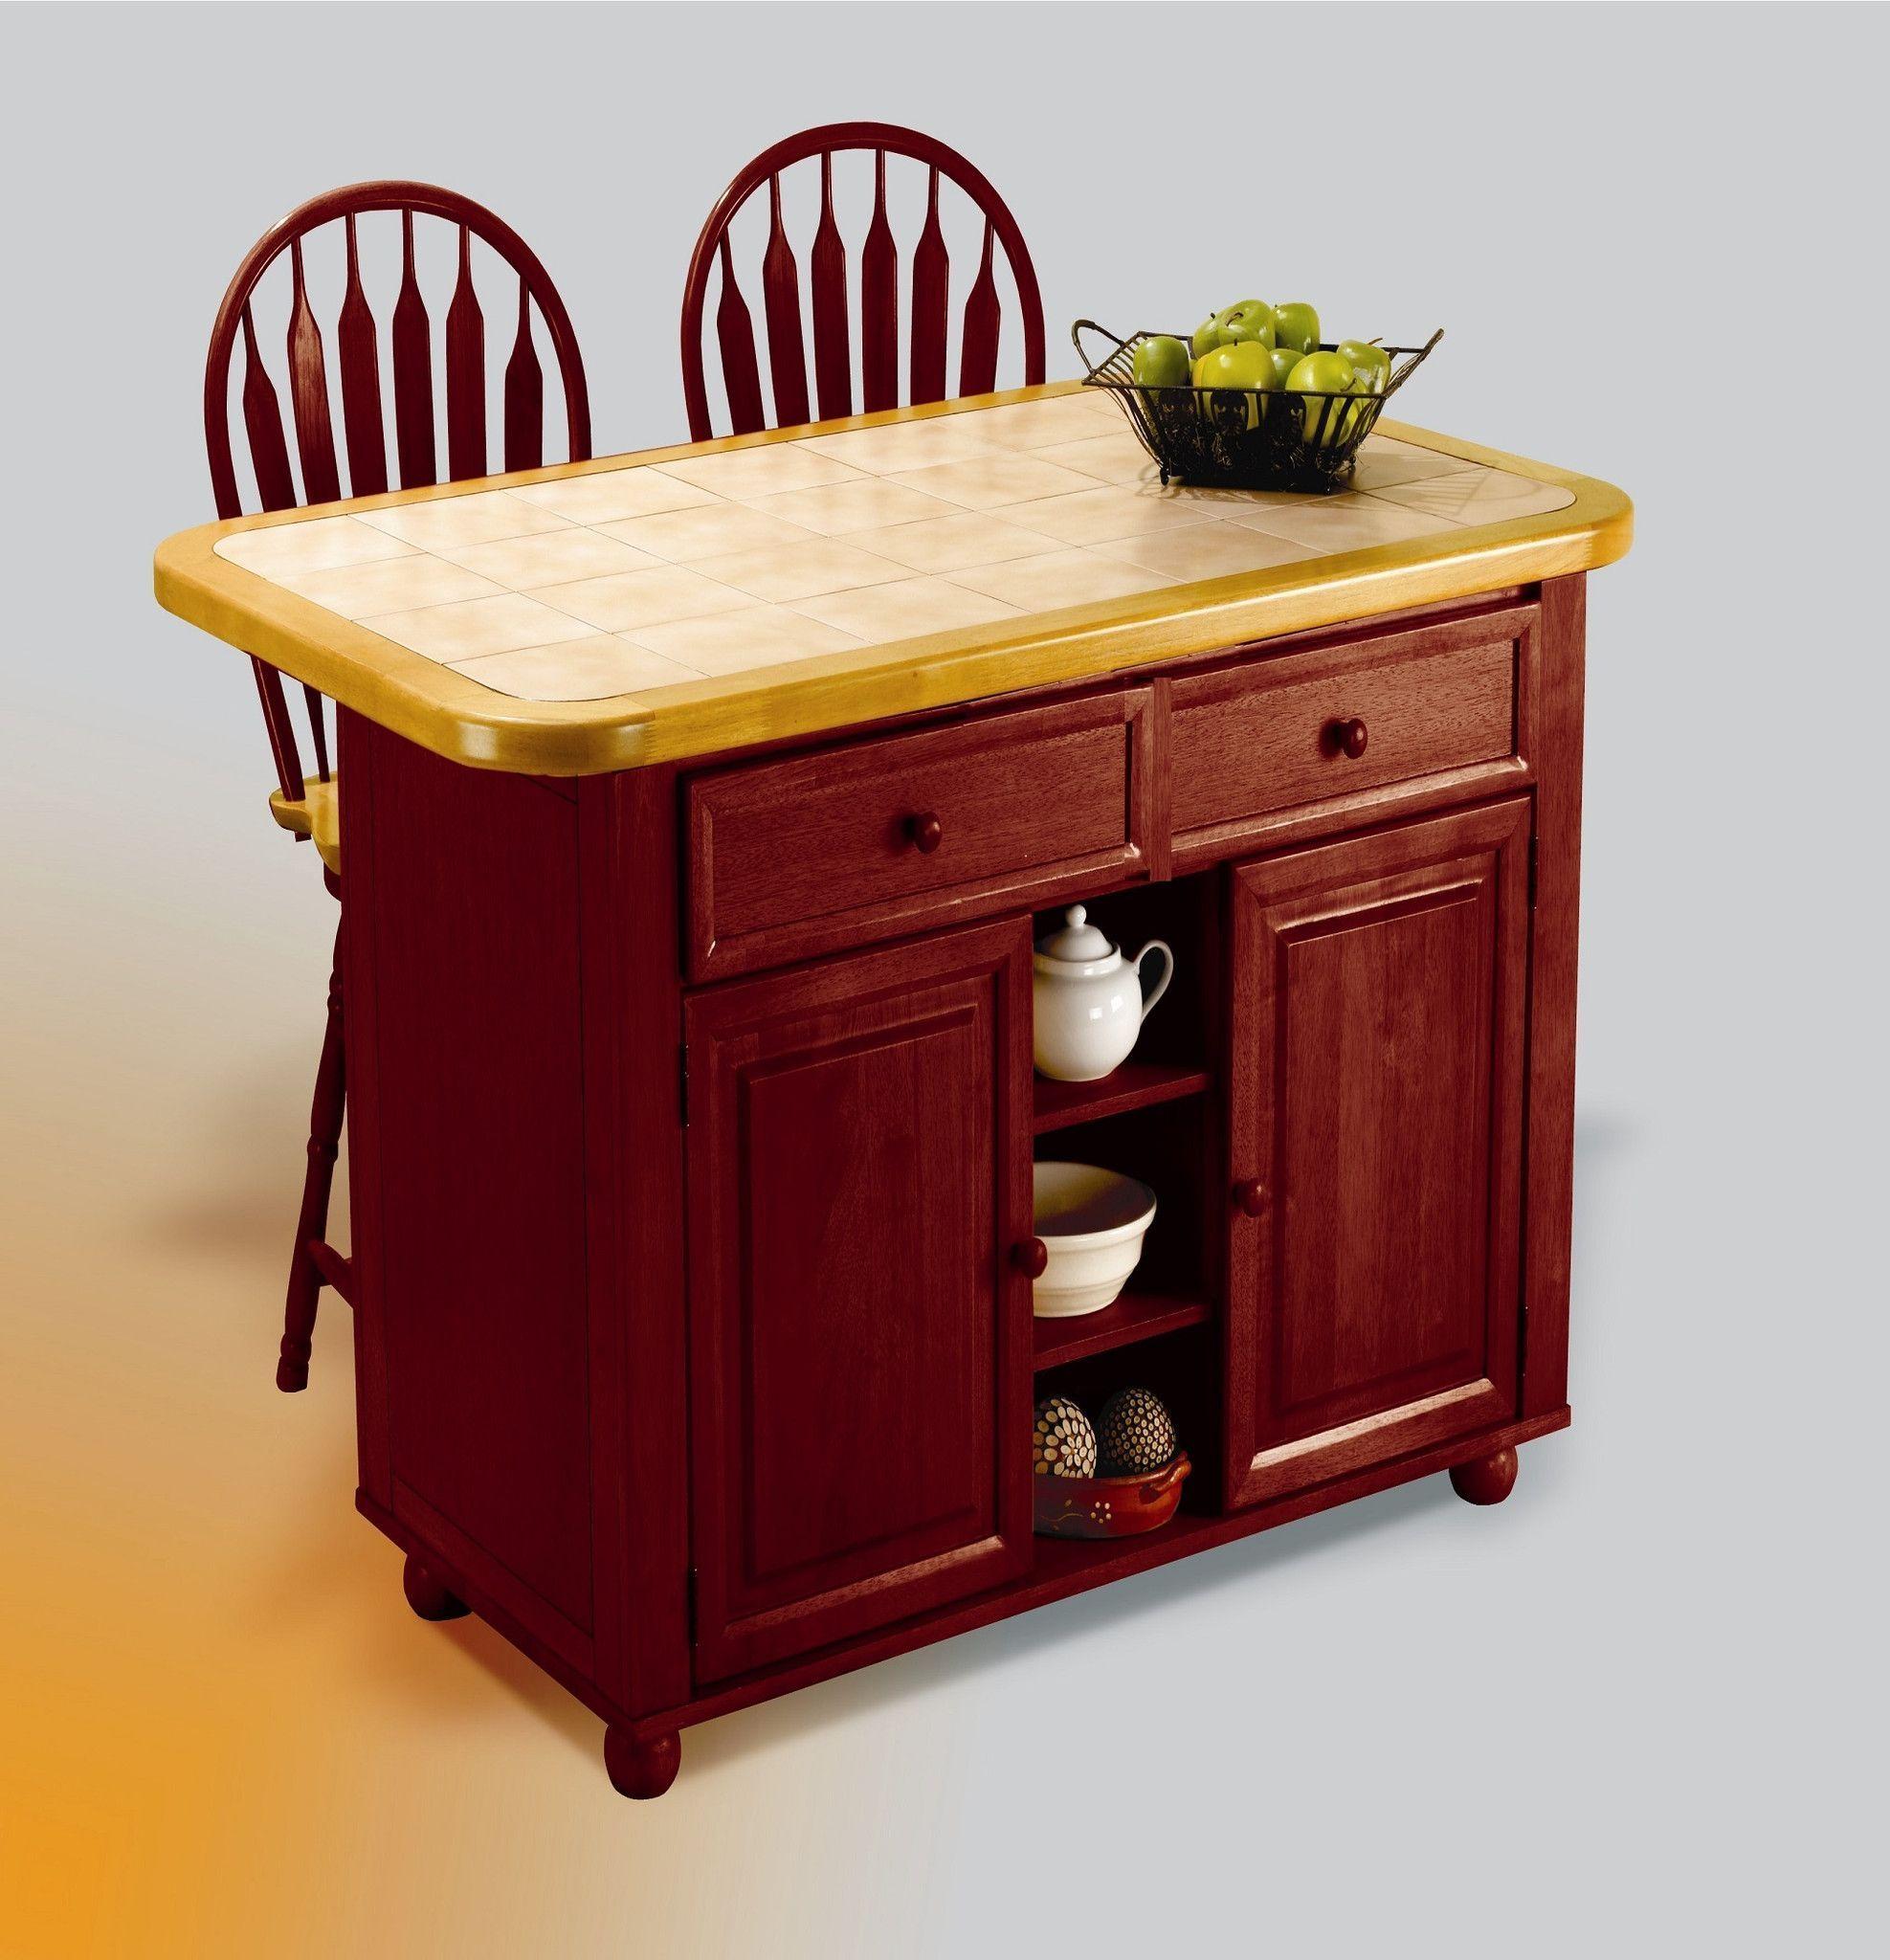 Small kitchen design nyc amazing kitchen ideas in pinterest